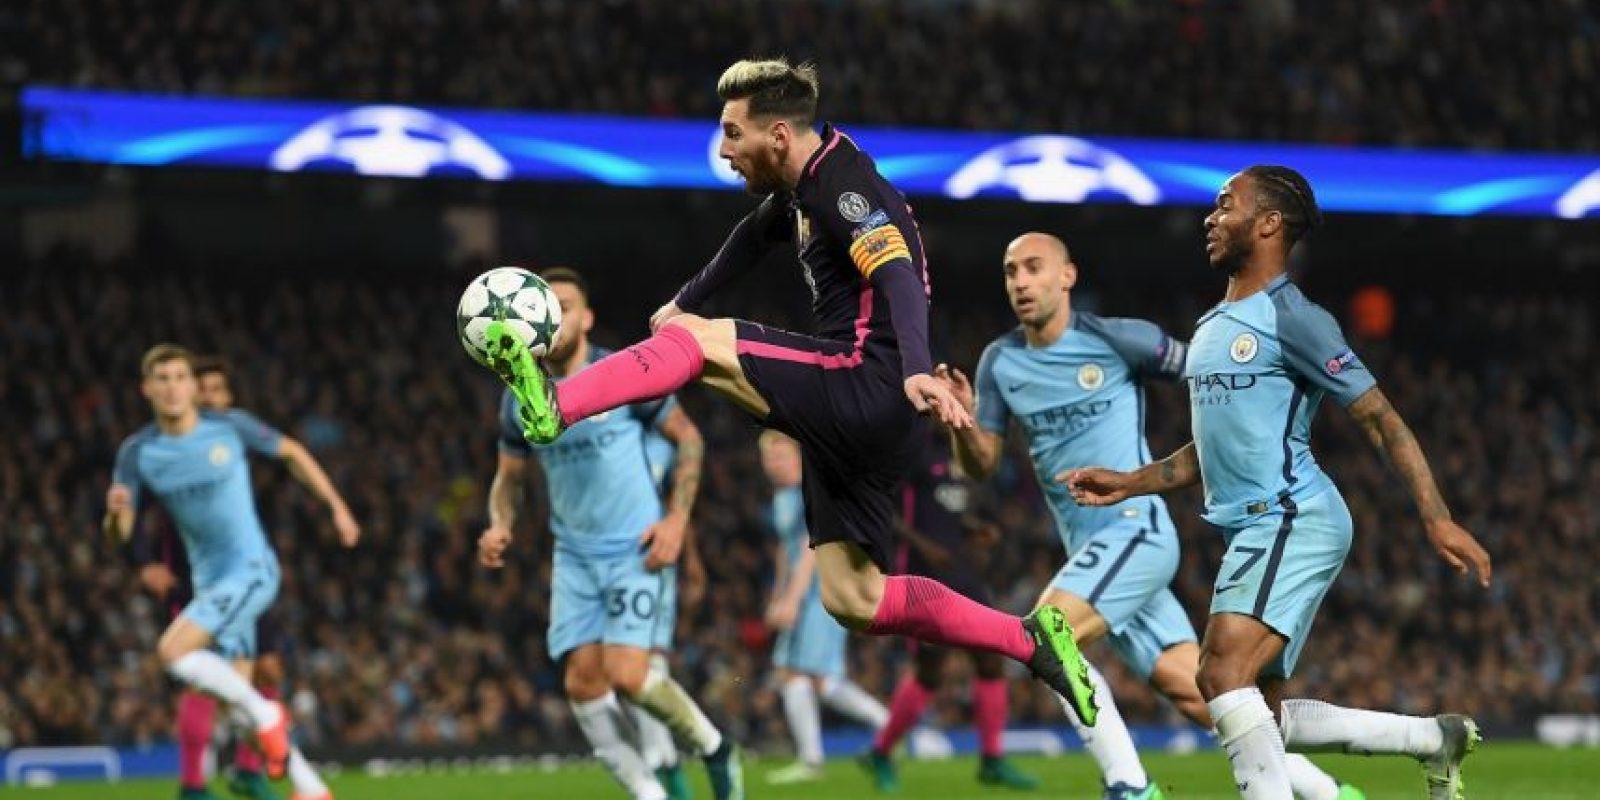 Lionel Messi se volvió viral al ser comparado con una iguana Foto:Getty Images